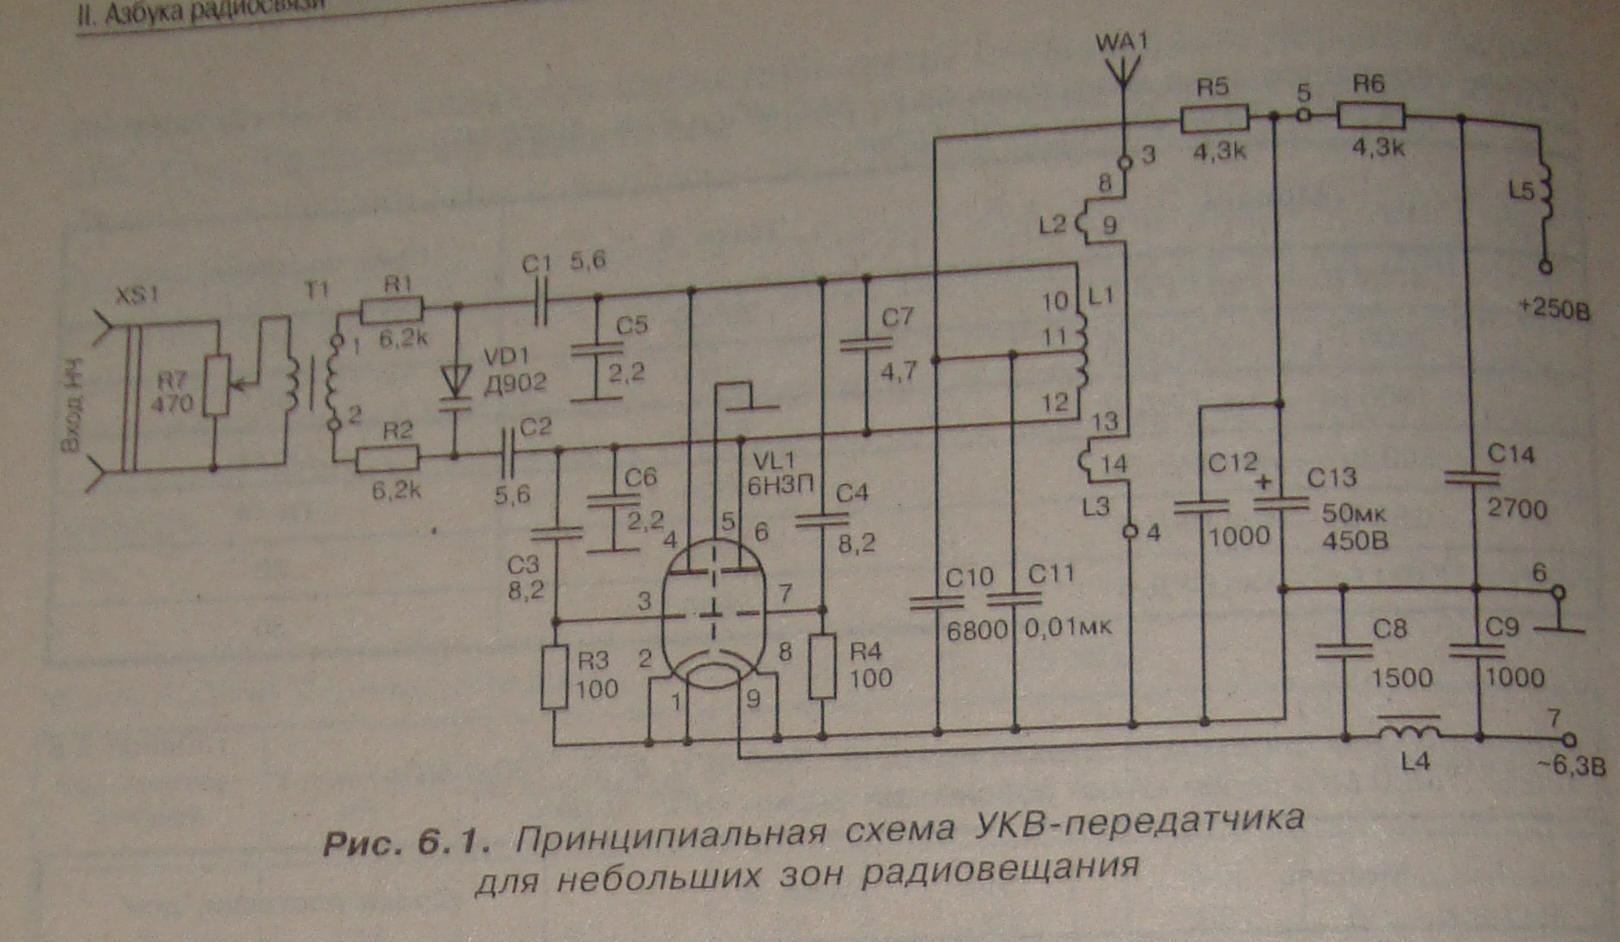 Передатчик схема кв диапазона